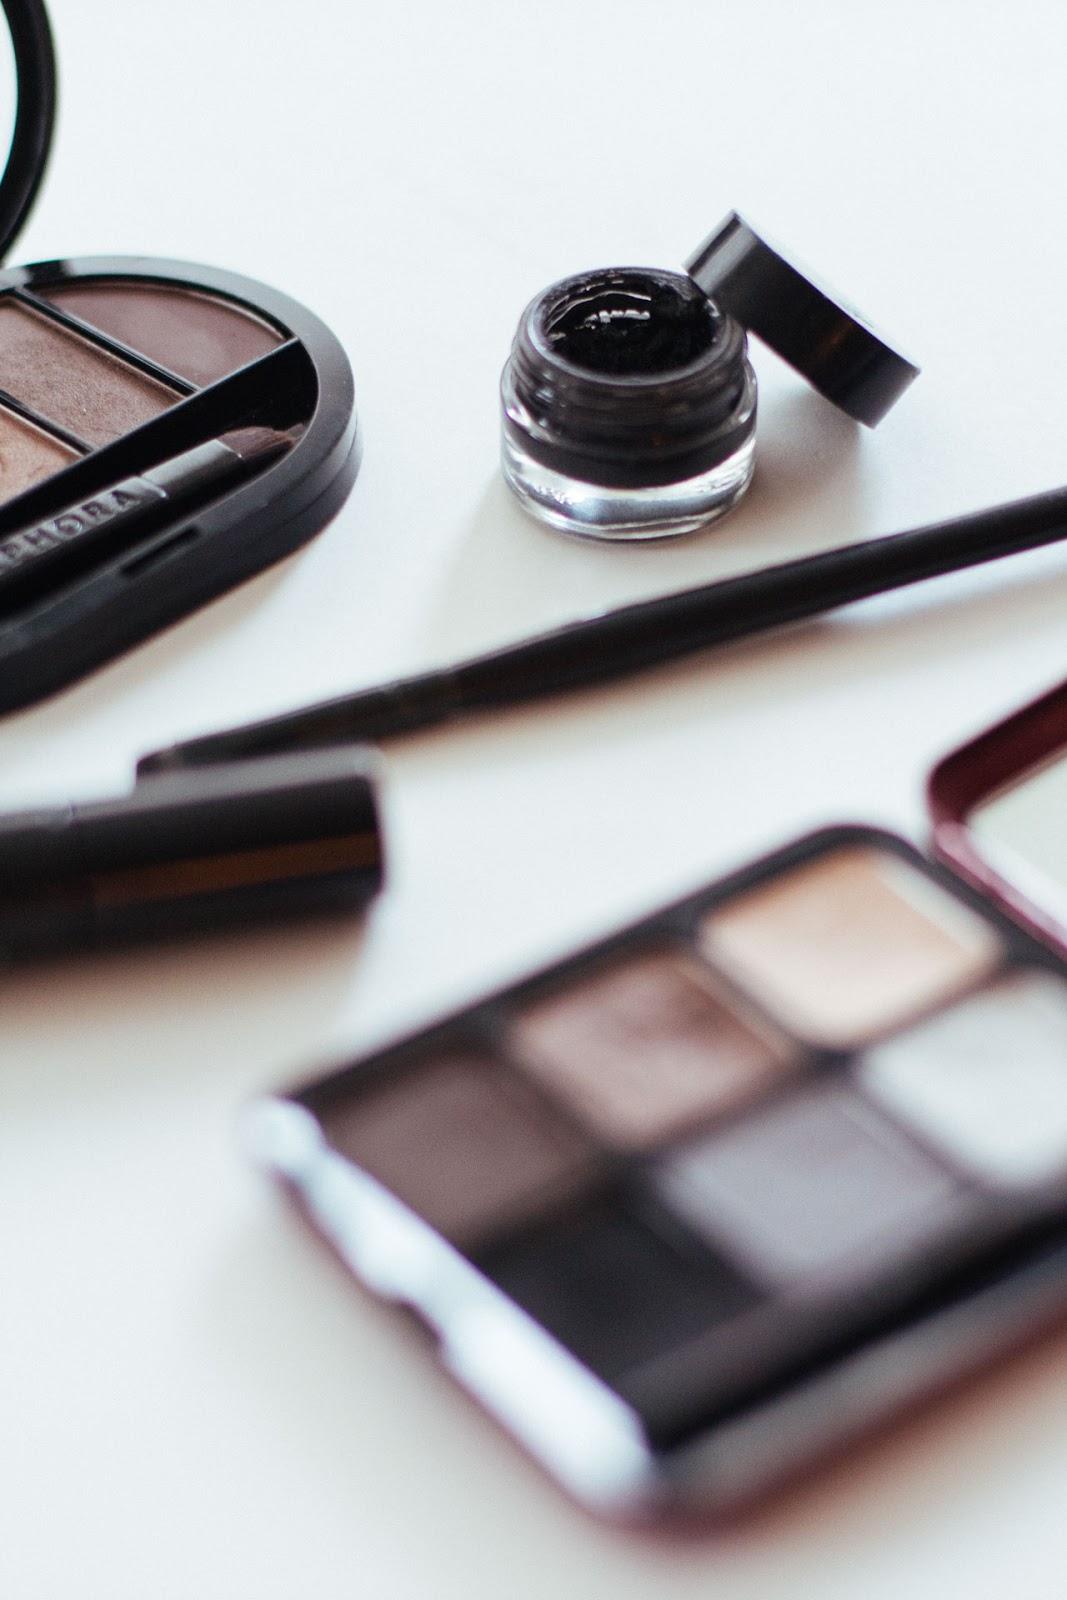 Smokey eye make-up - Vancouver Fashion Blogger